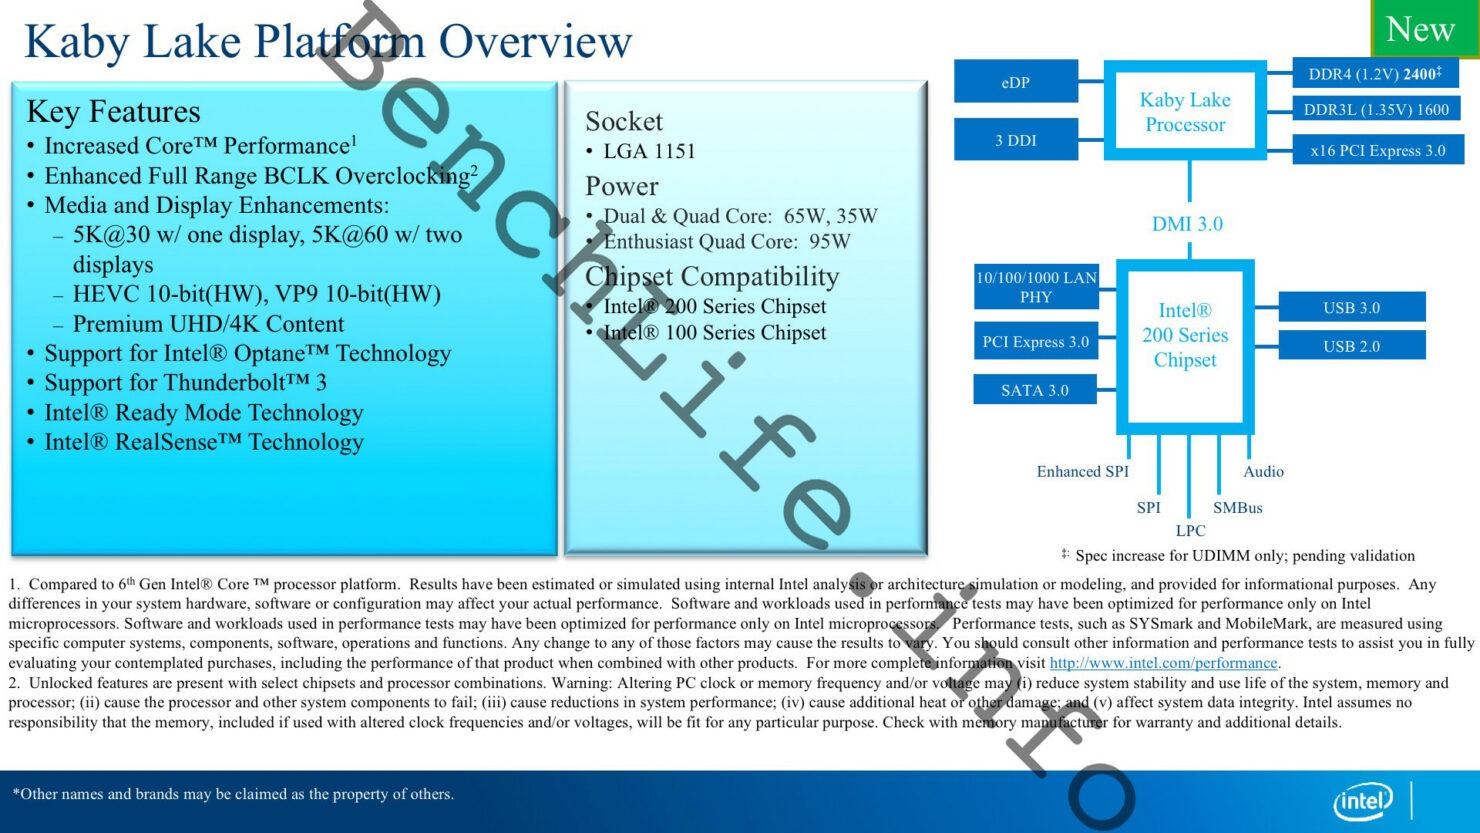 intel-kaby-lake-desktop-platform-overview